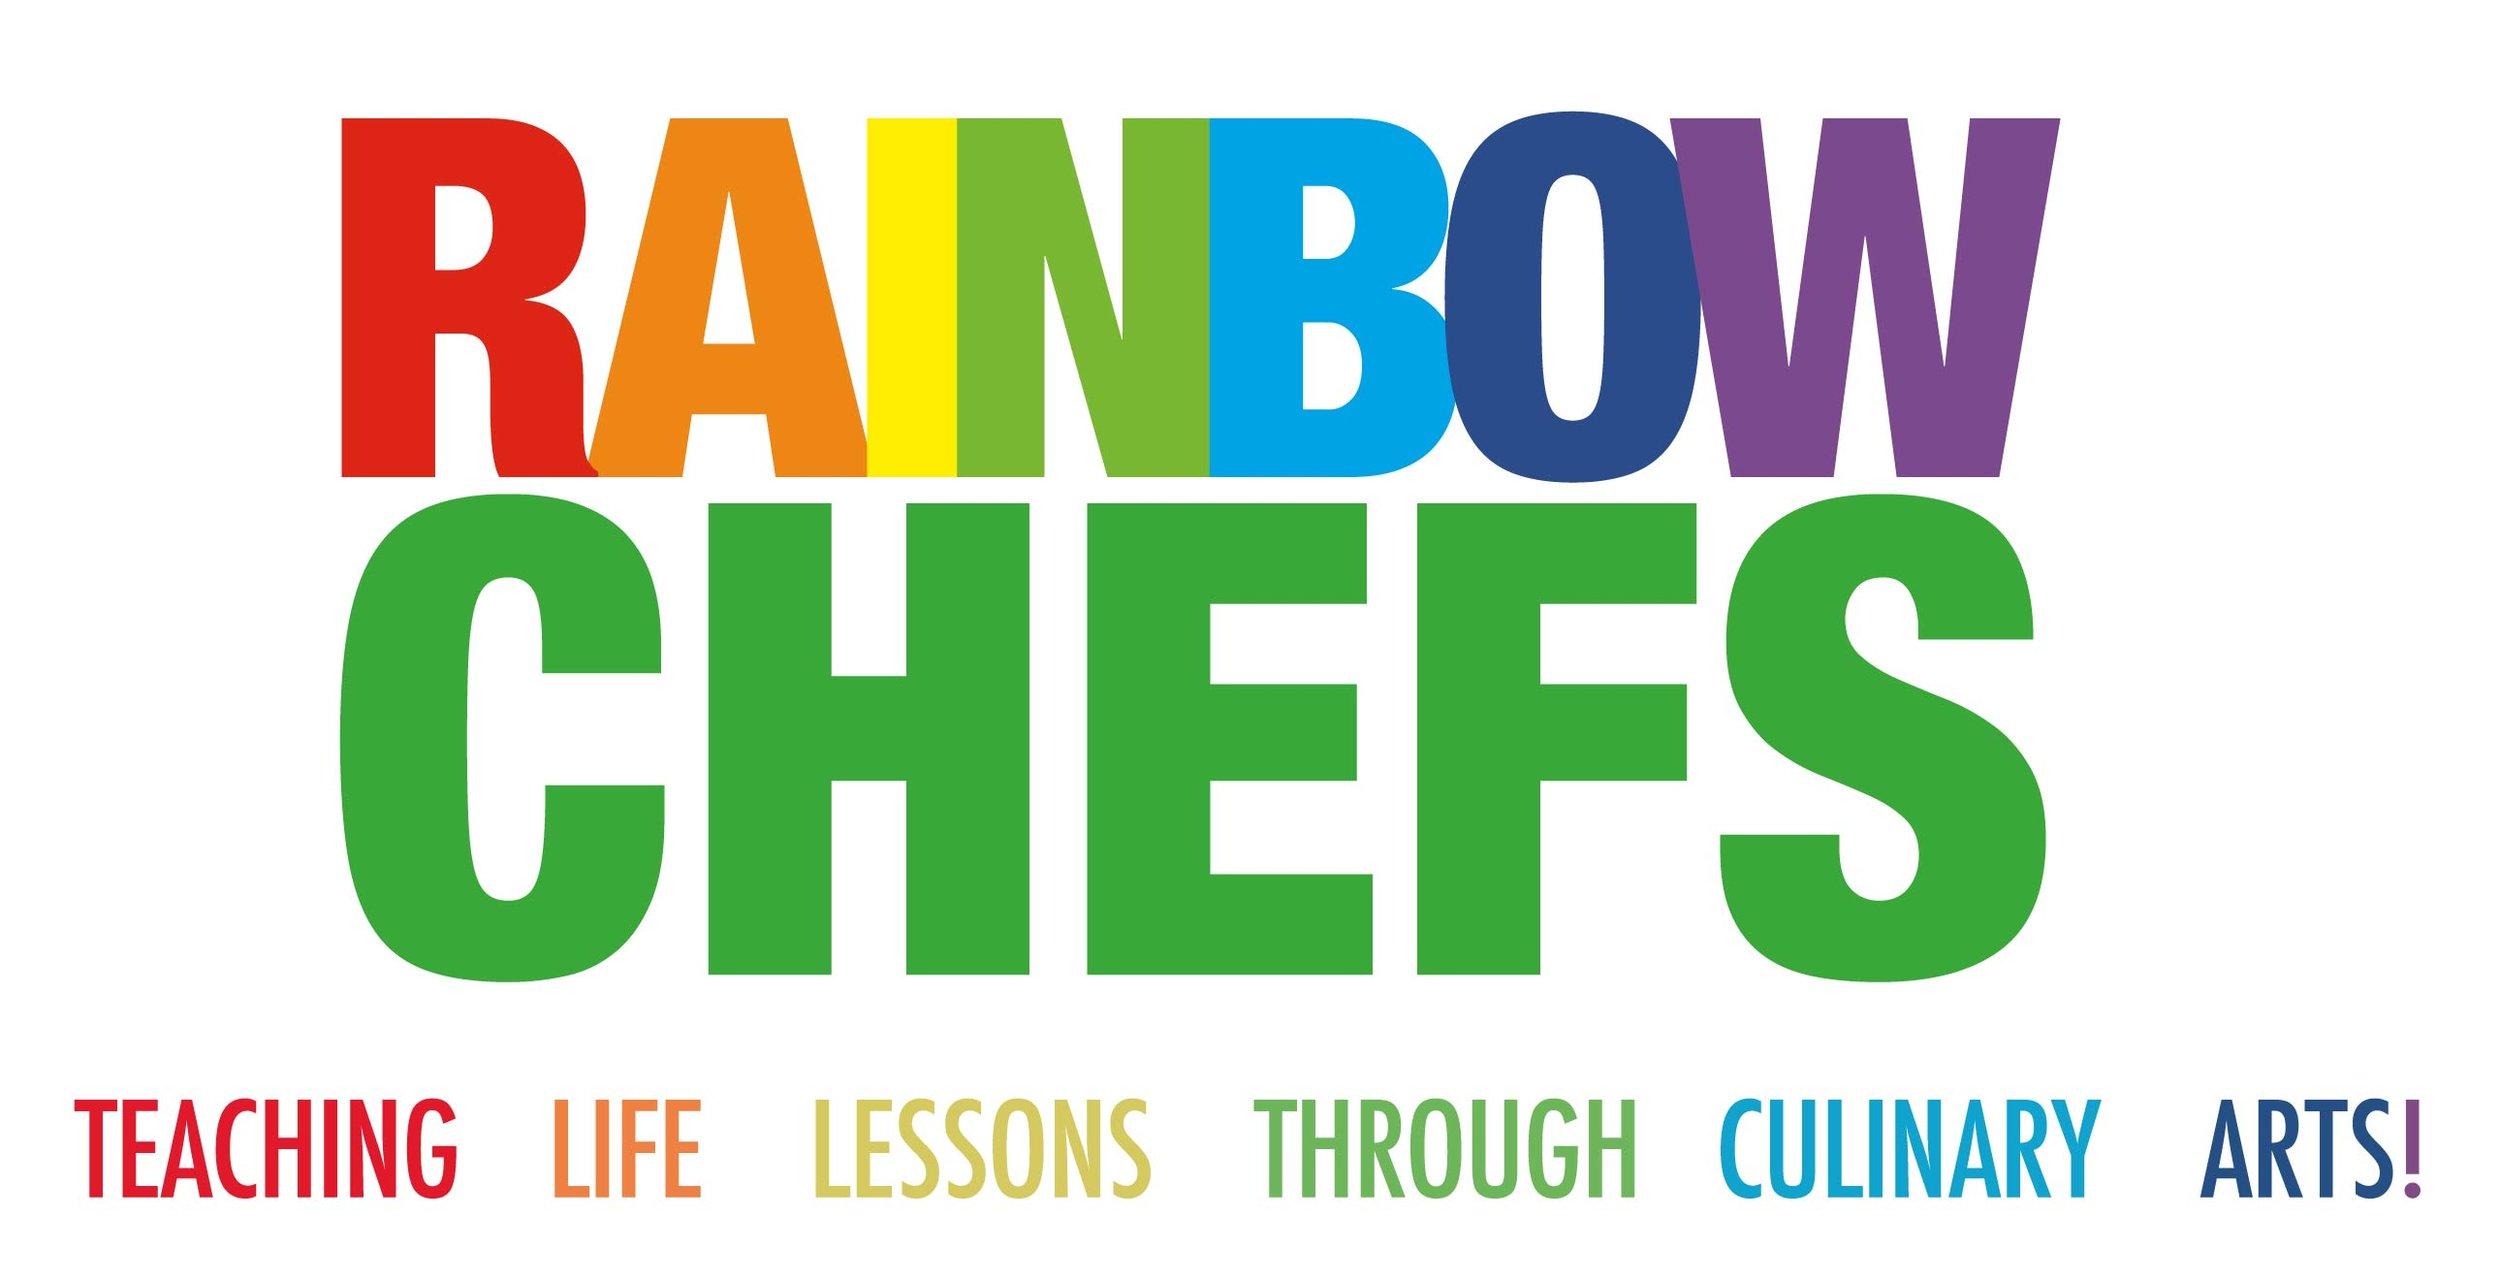 Rainbow Chefs Logo-01 (no kids).jpg